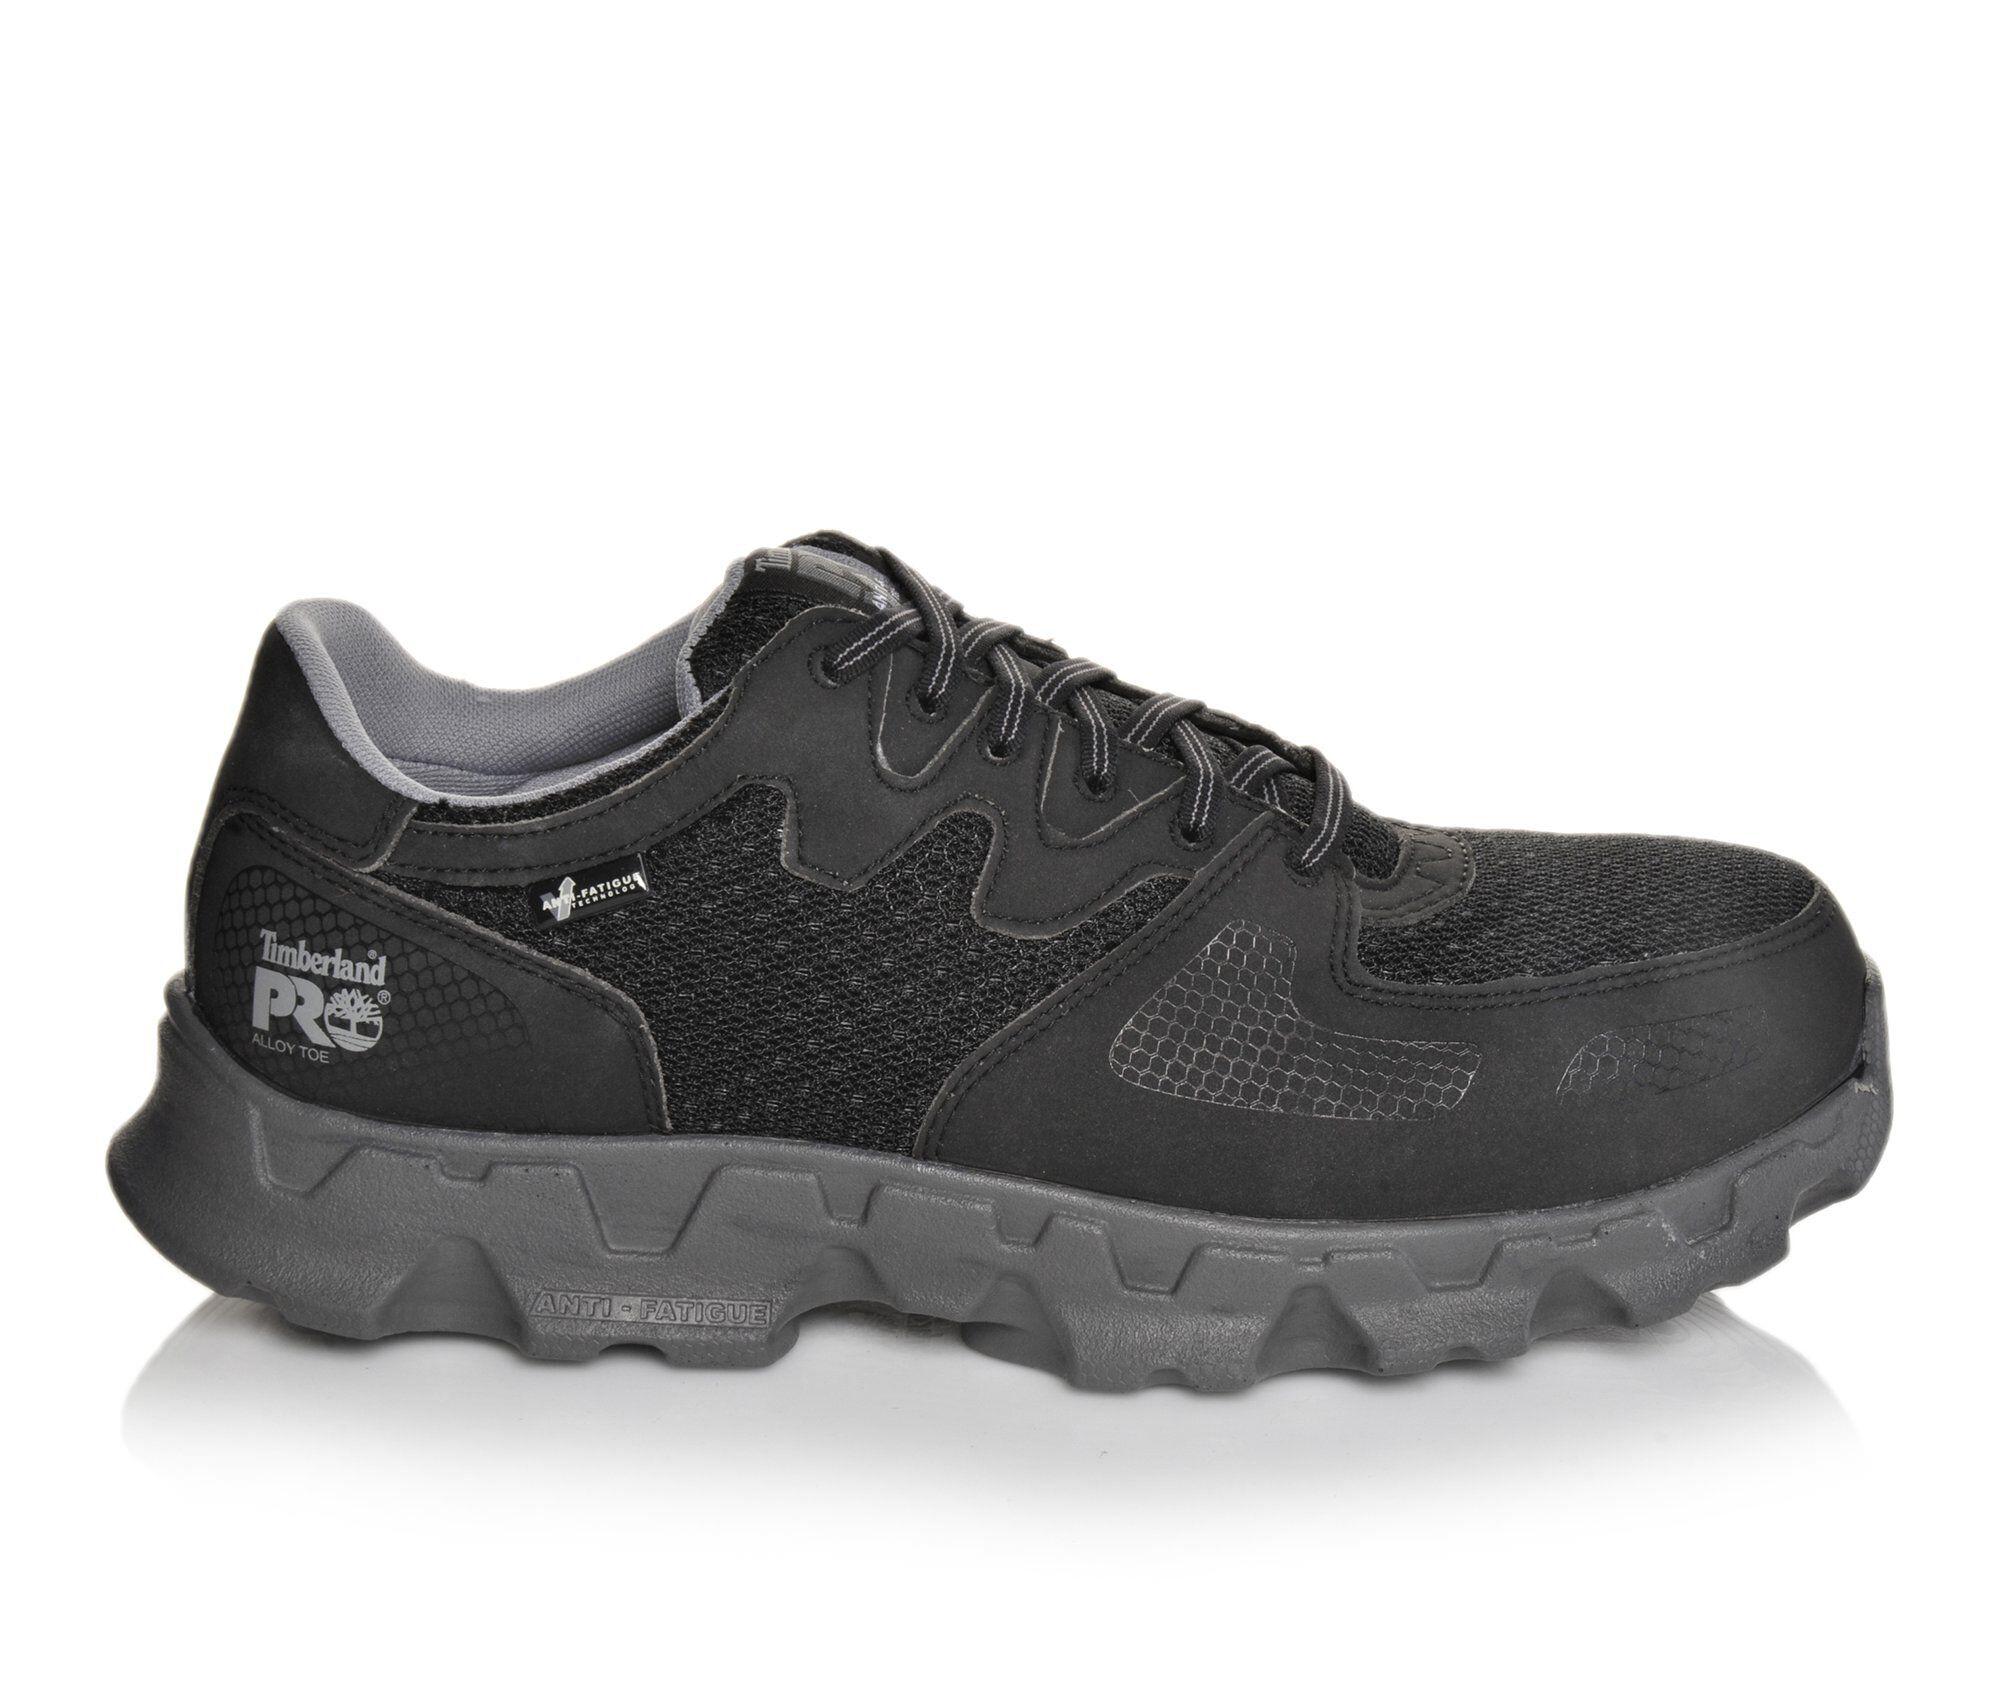 Men's Timberland Pro Powertrain 92649 Alloy Toe Work Shoes Black/Grey